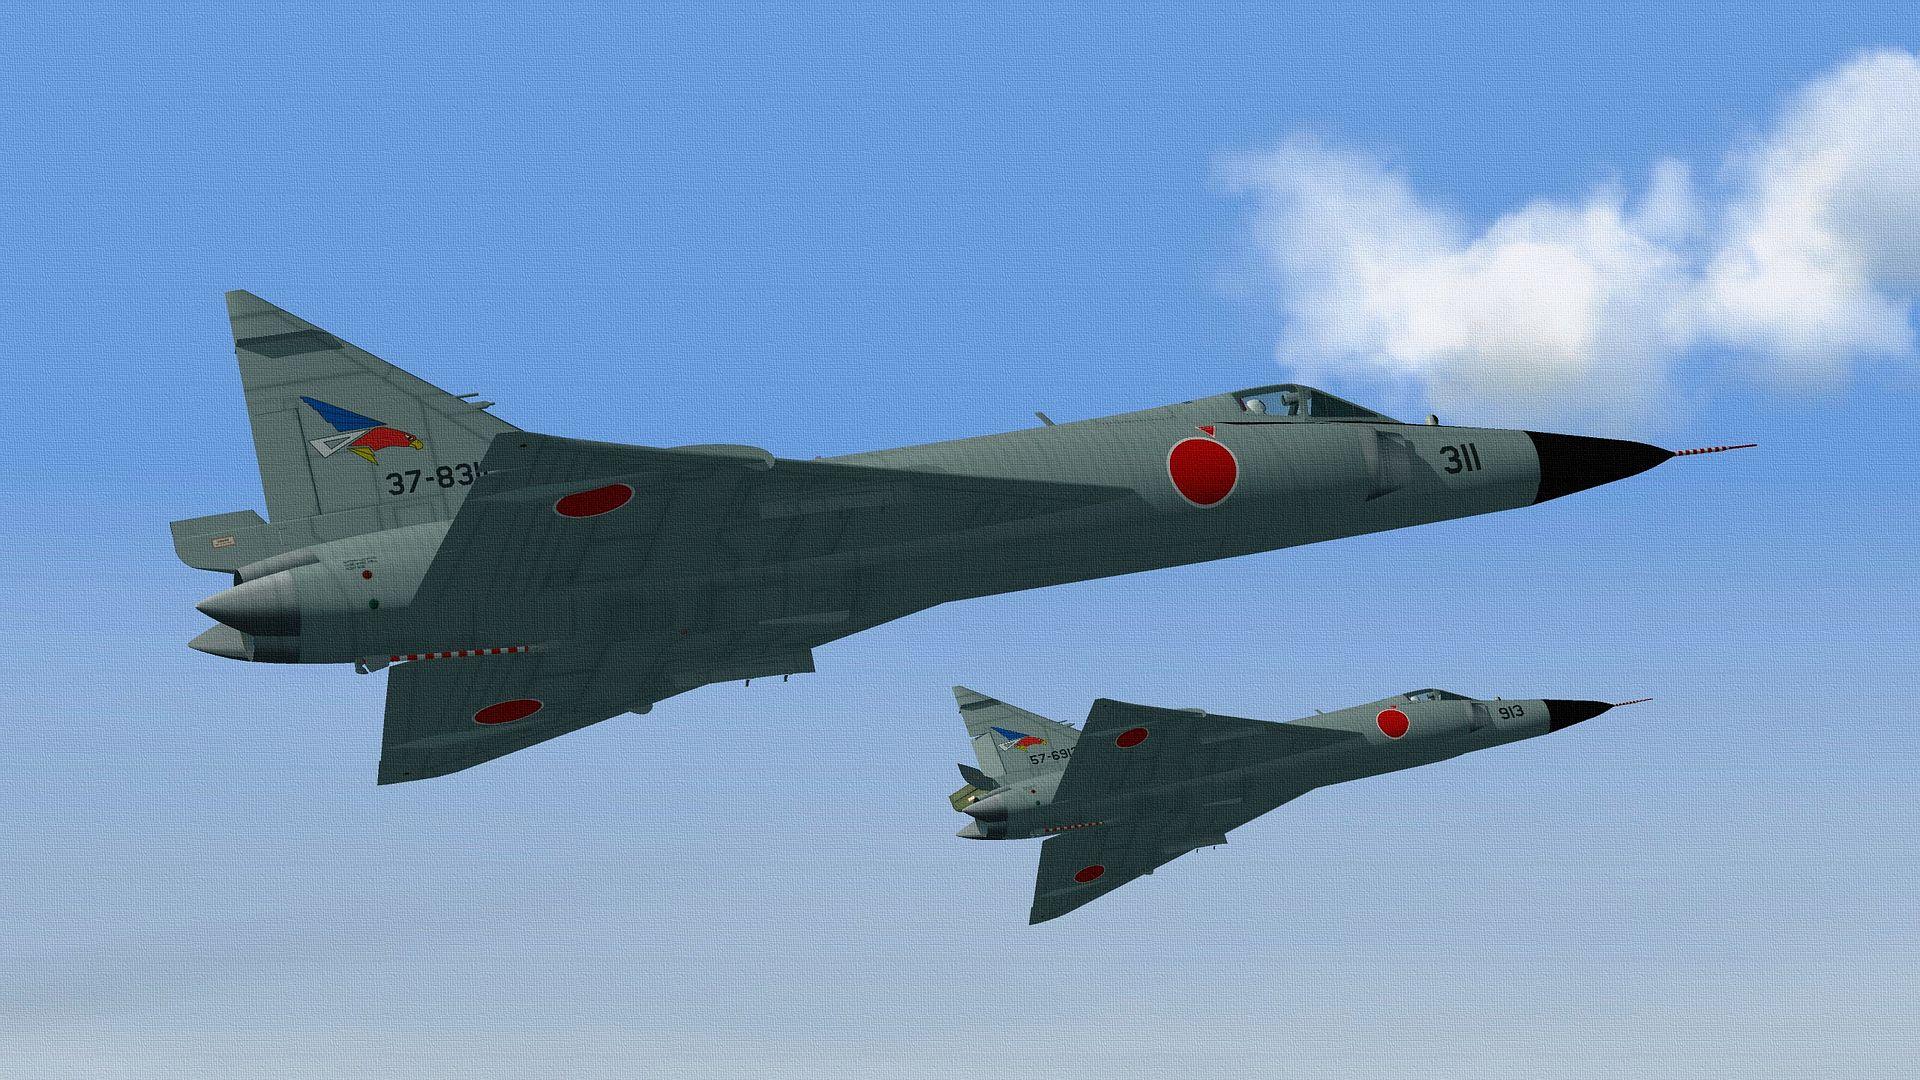 JASDF%20F-102A%20DELTA%20DAGGER.08_zpsgi